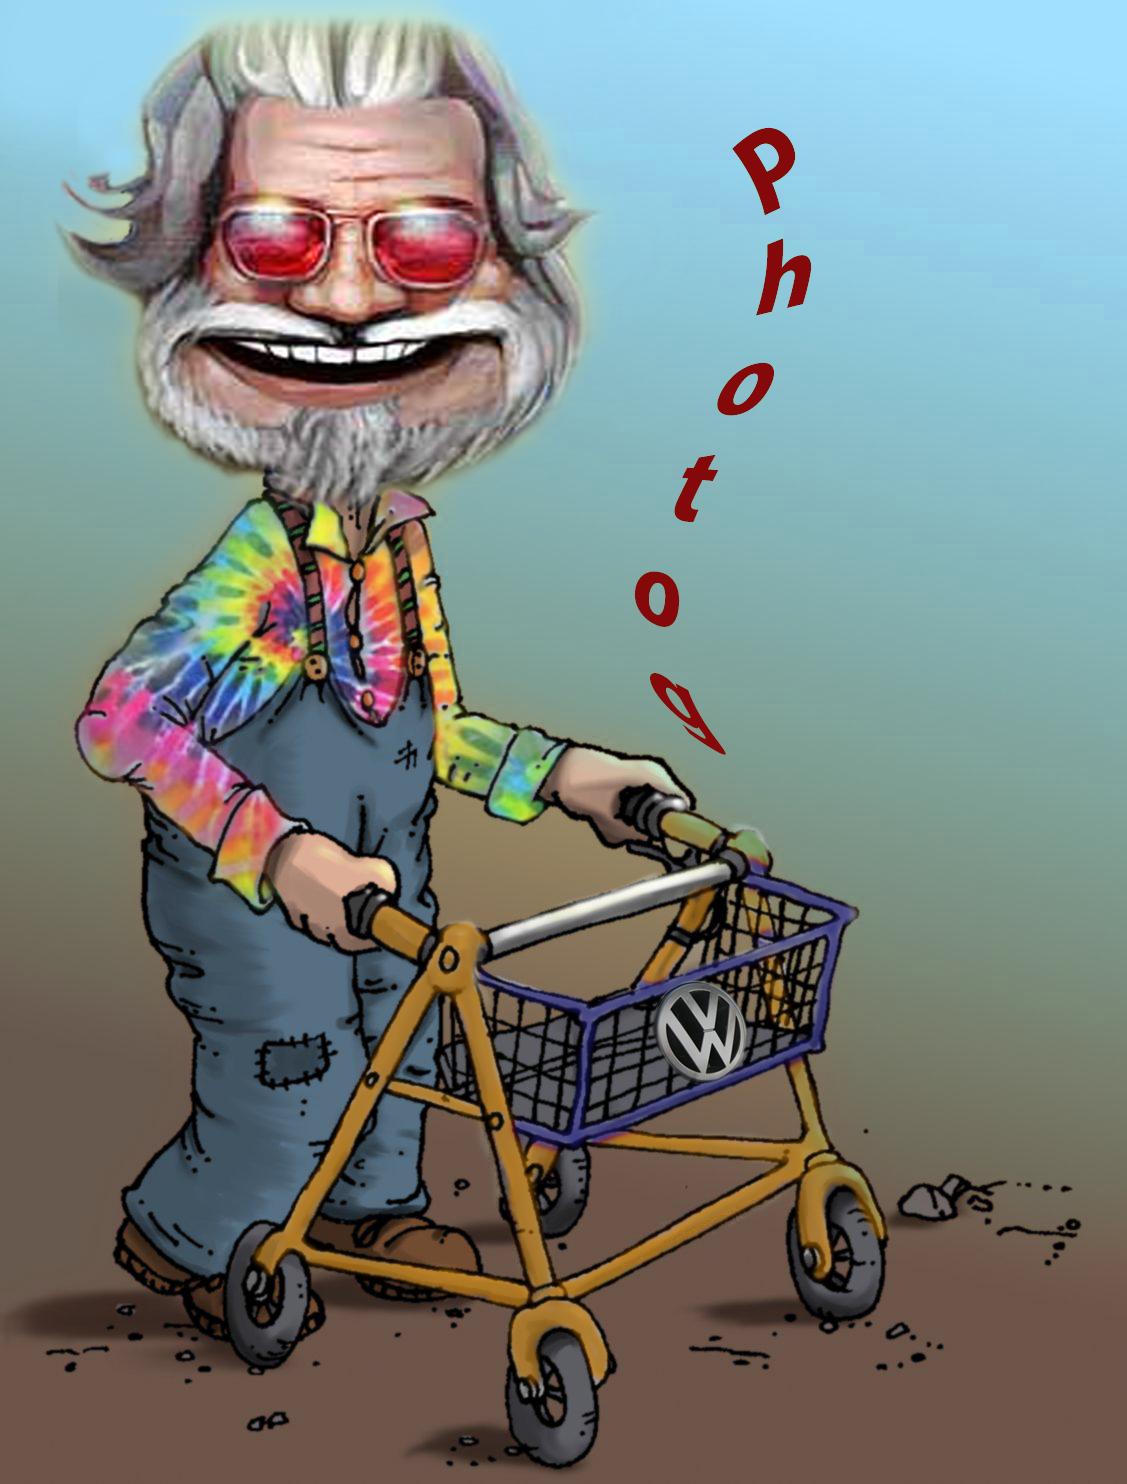 Jerry-Rollator_man-Skyblue.jpg